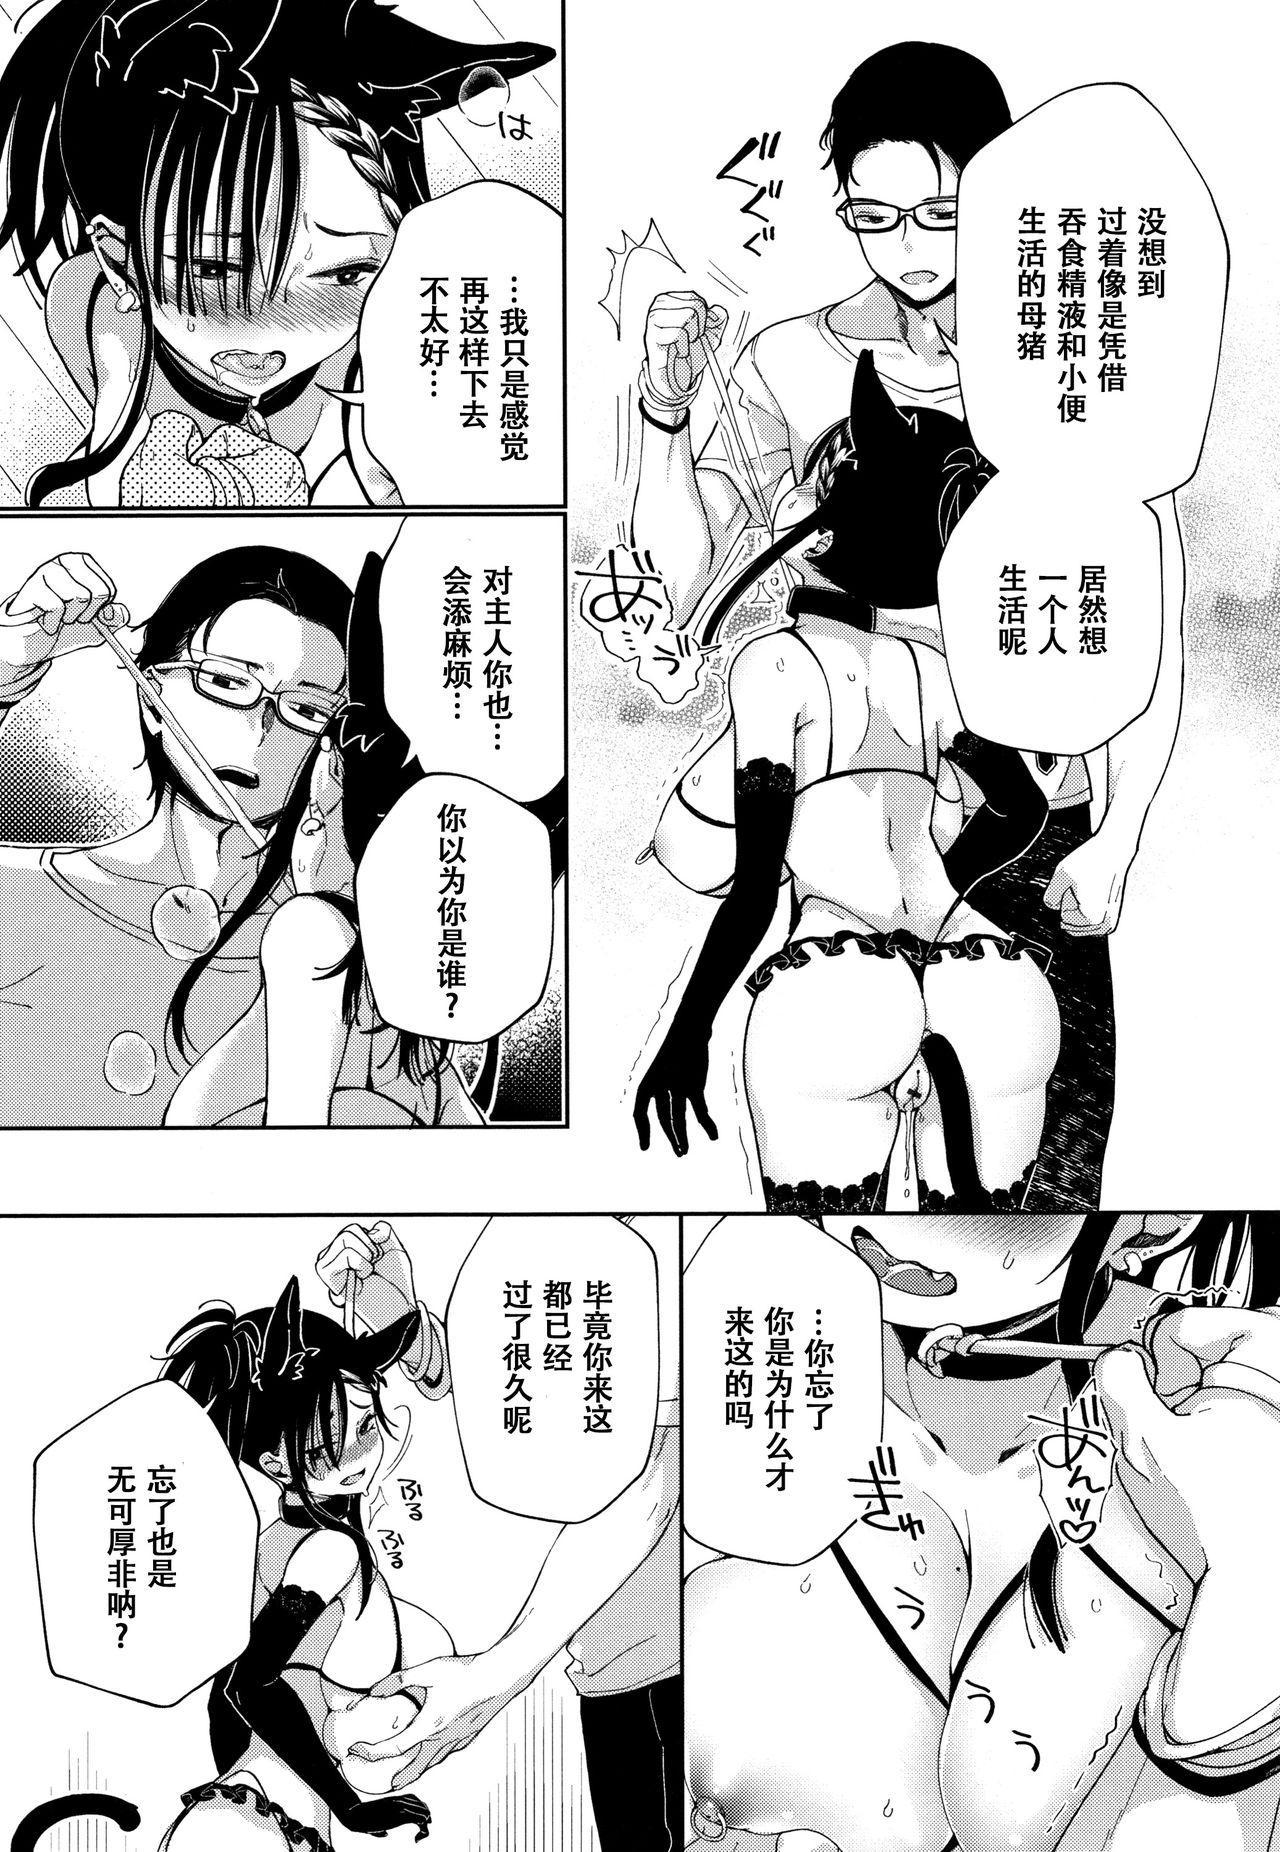 [Achumuchi] Saijaku Gal wa Ikizurai! - The weakest pussy is hard to go.ch.1-8 [Chinese] [战栗的玻璃棒汉化] [Ongoing] 82